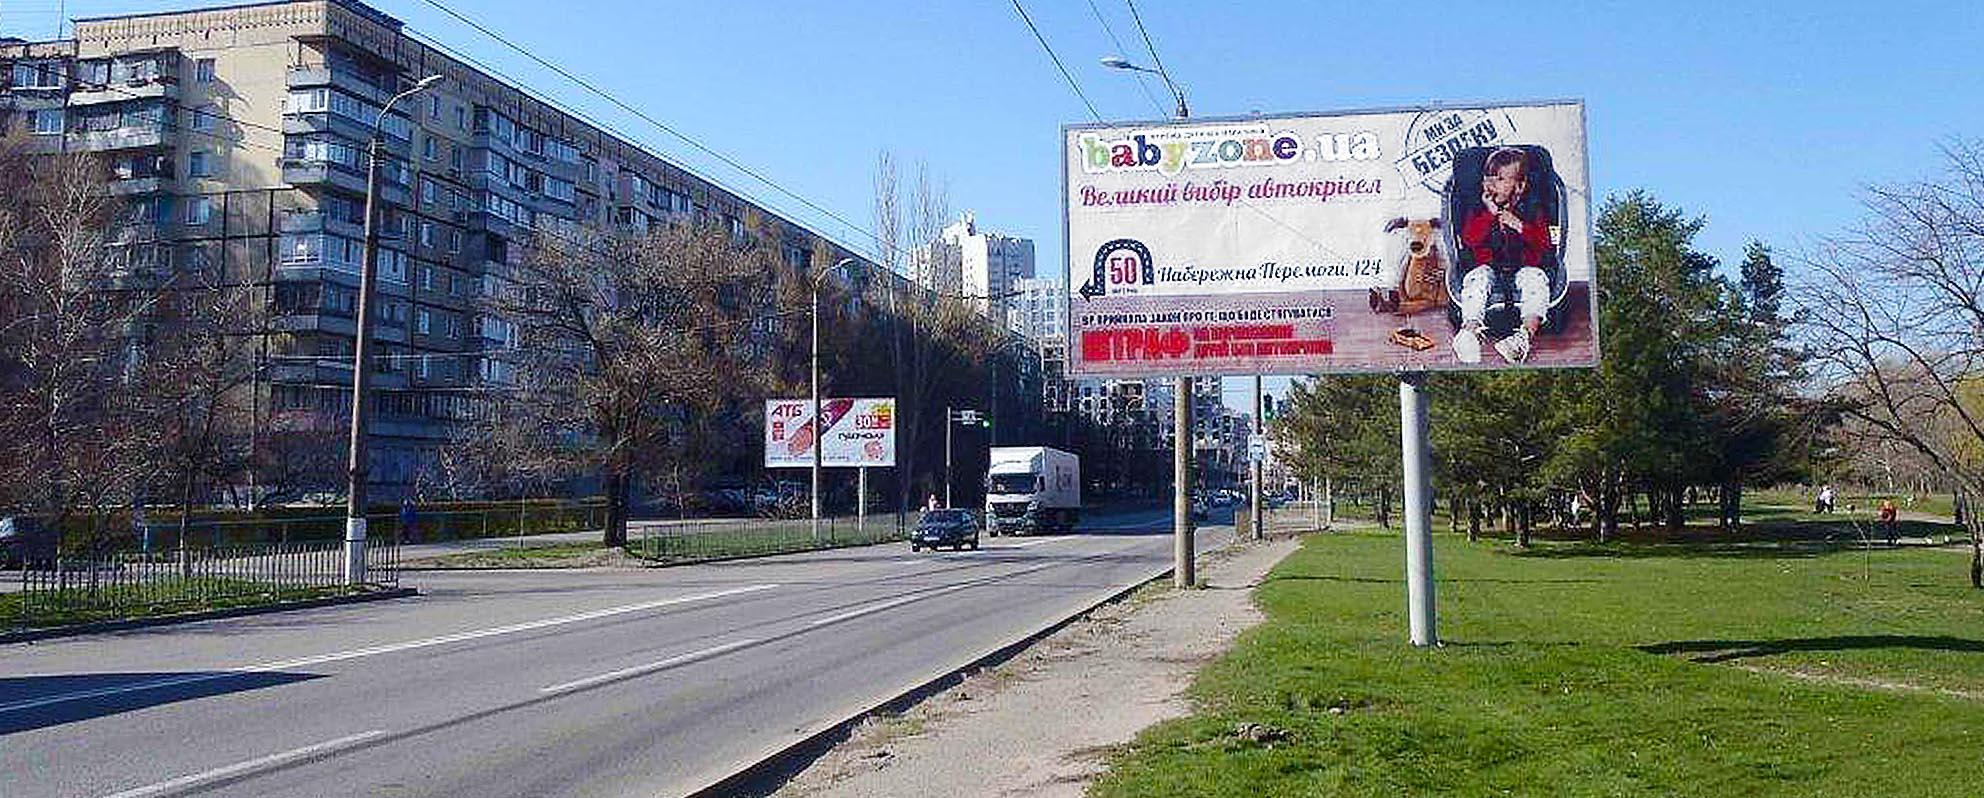 Реклама на білбордах магазину Babyzone